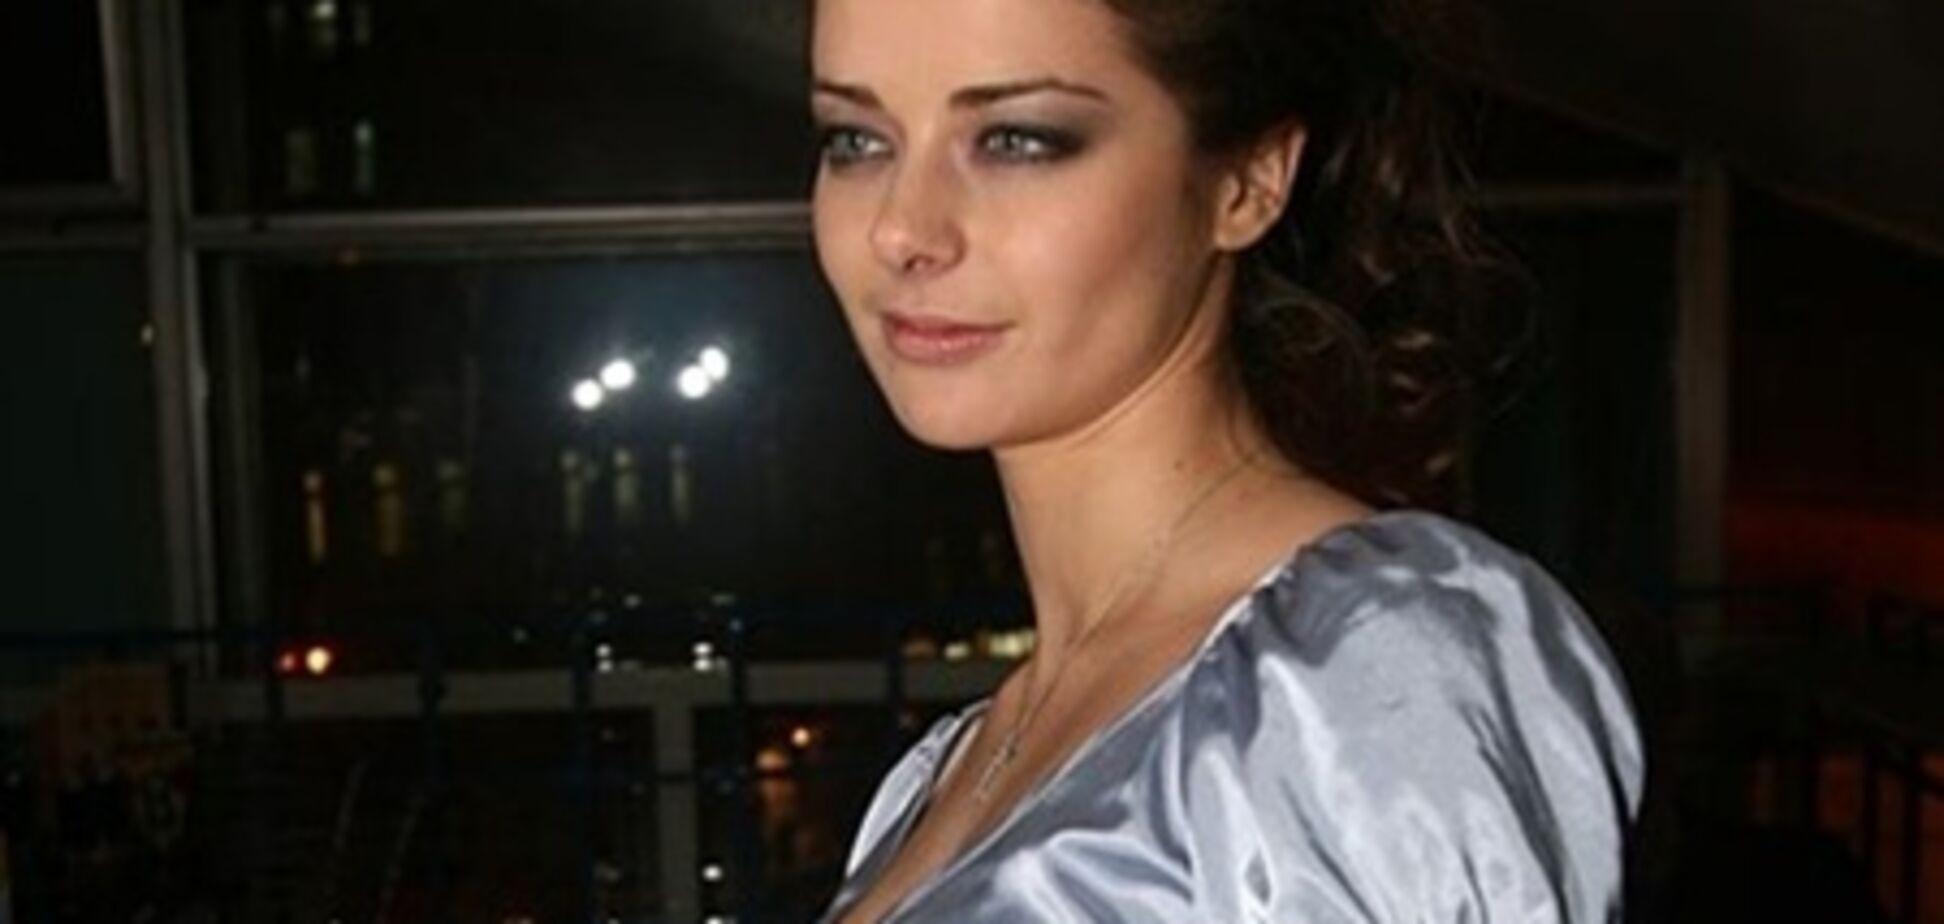 Александрова опозорилась на кинофестивале